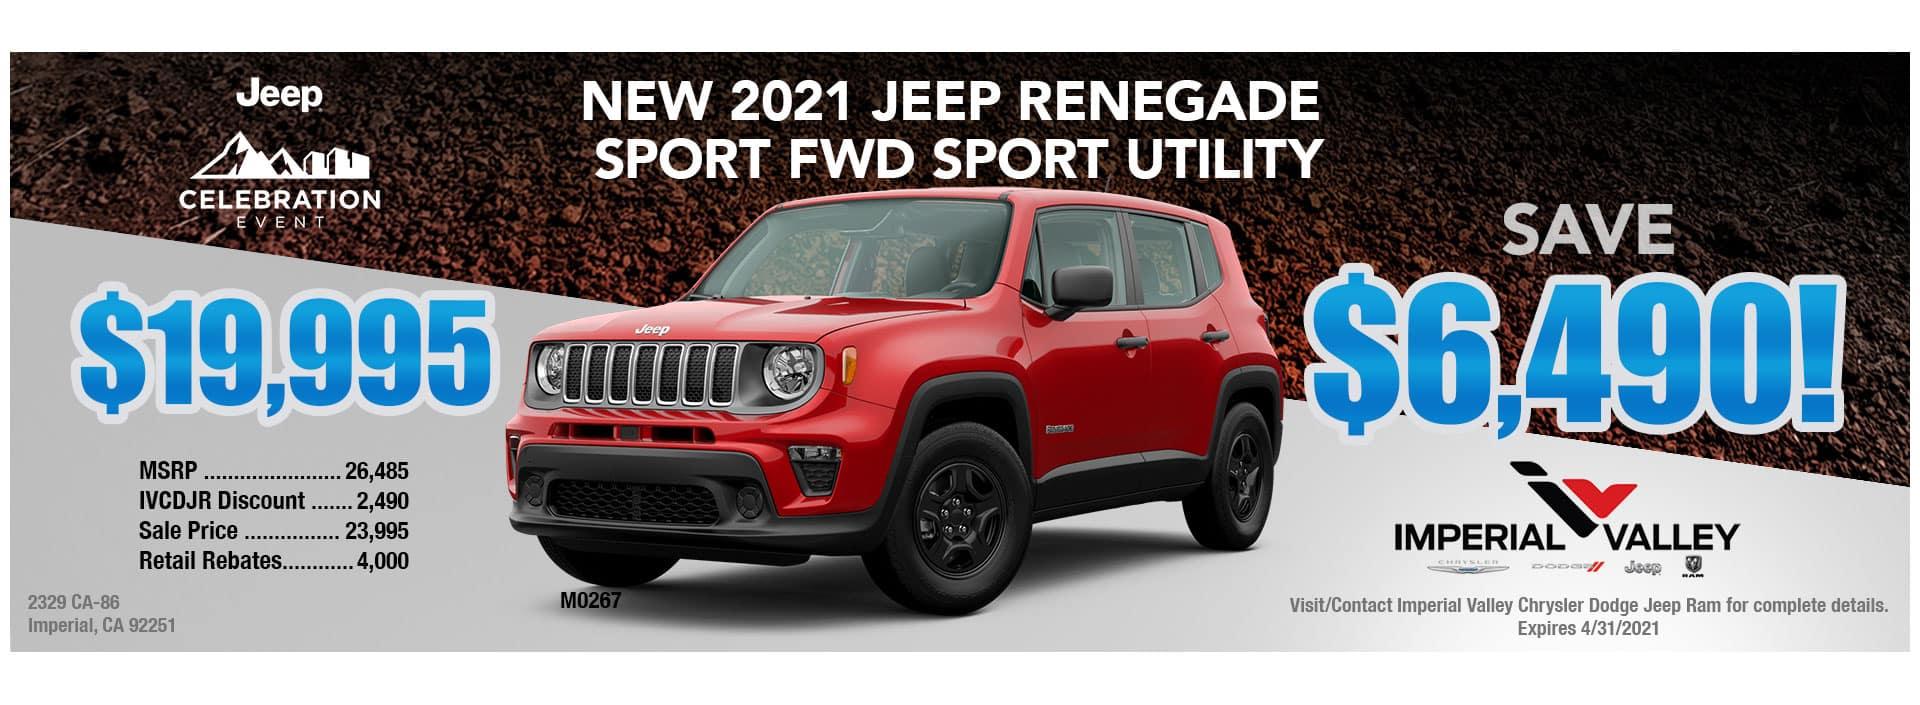 Slide-MO267-2021-jeep-renegade-sport-fwd-sport-utility-705